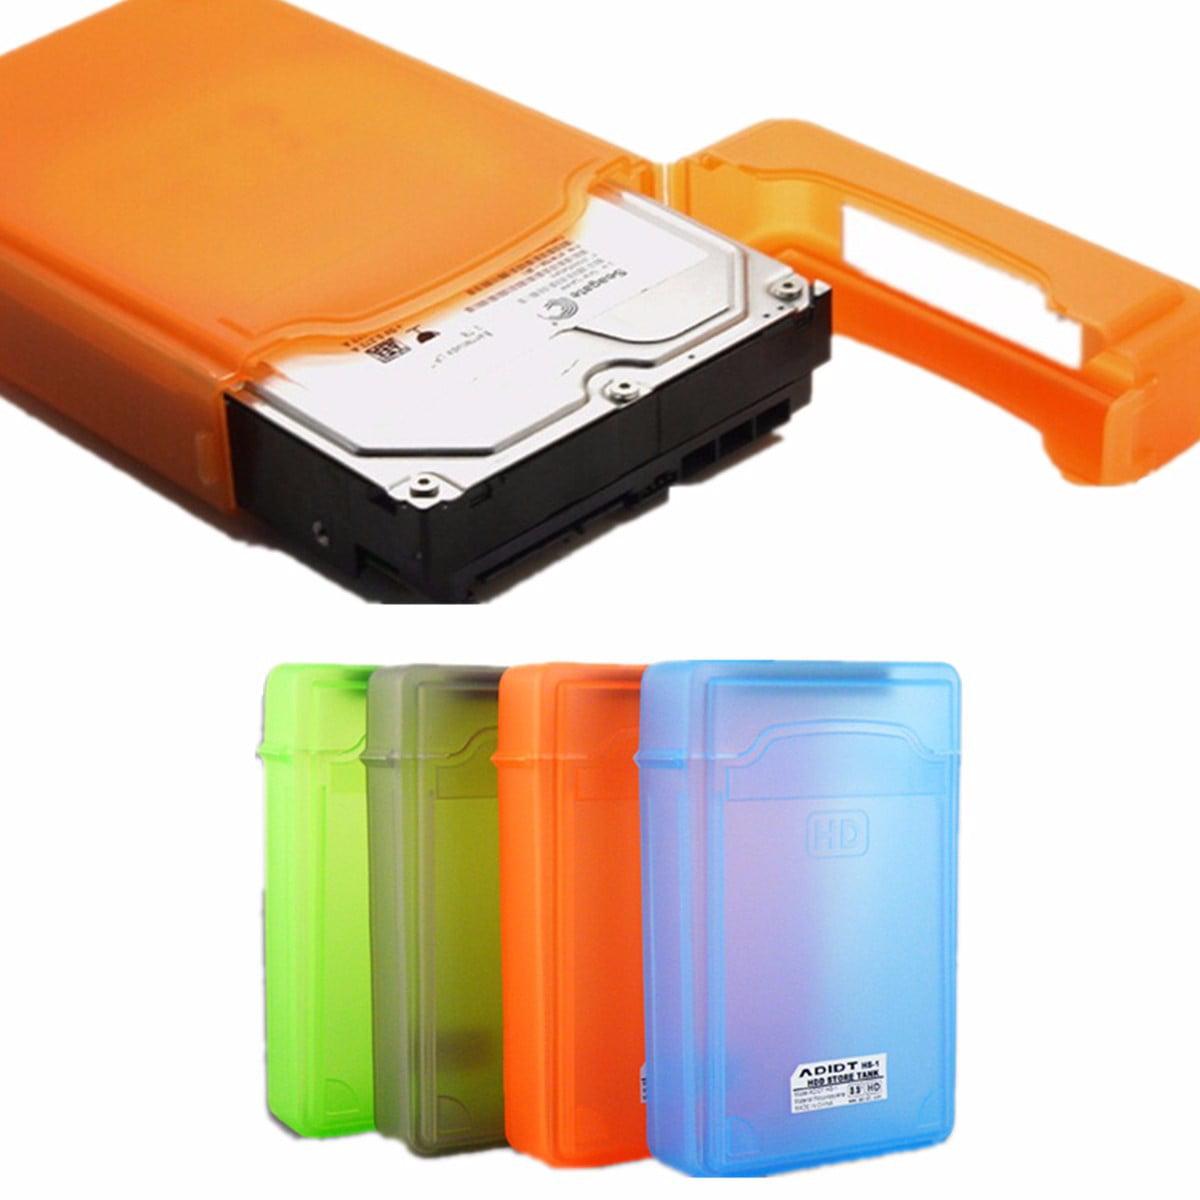 3.5 inch IDE SATA Hard Plastic Disk Drive HDD Protective Storage Cases Box New